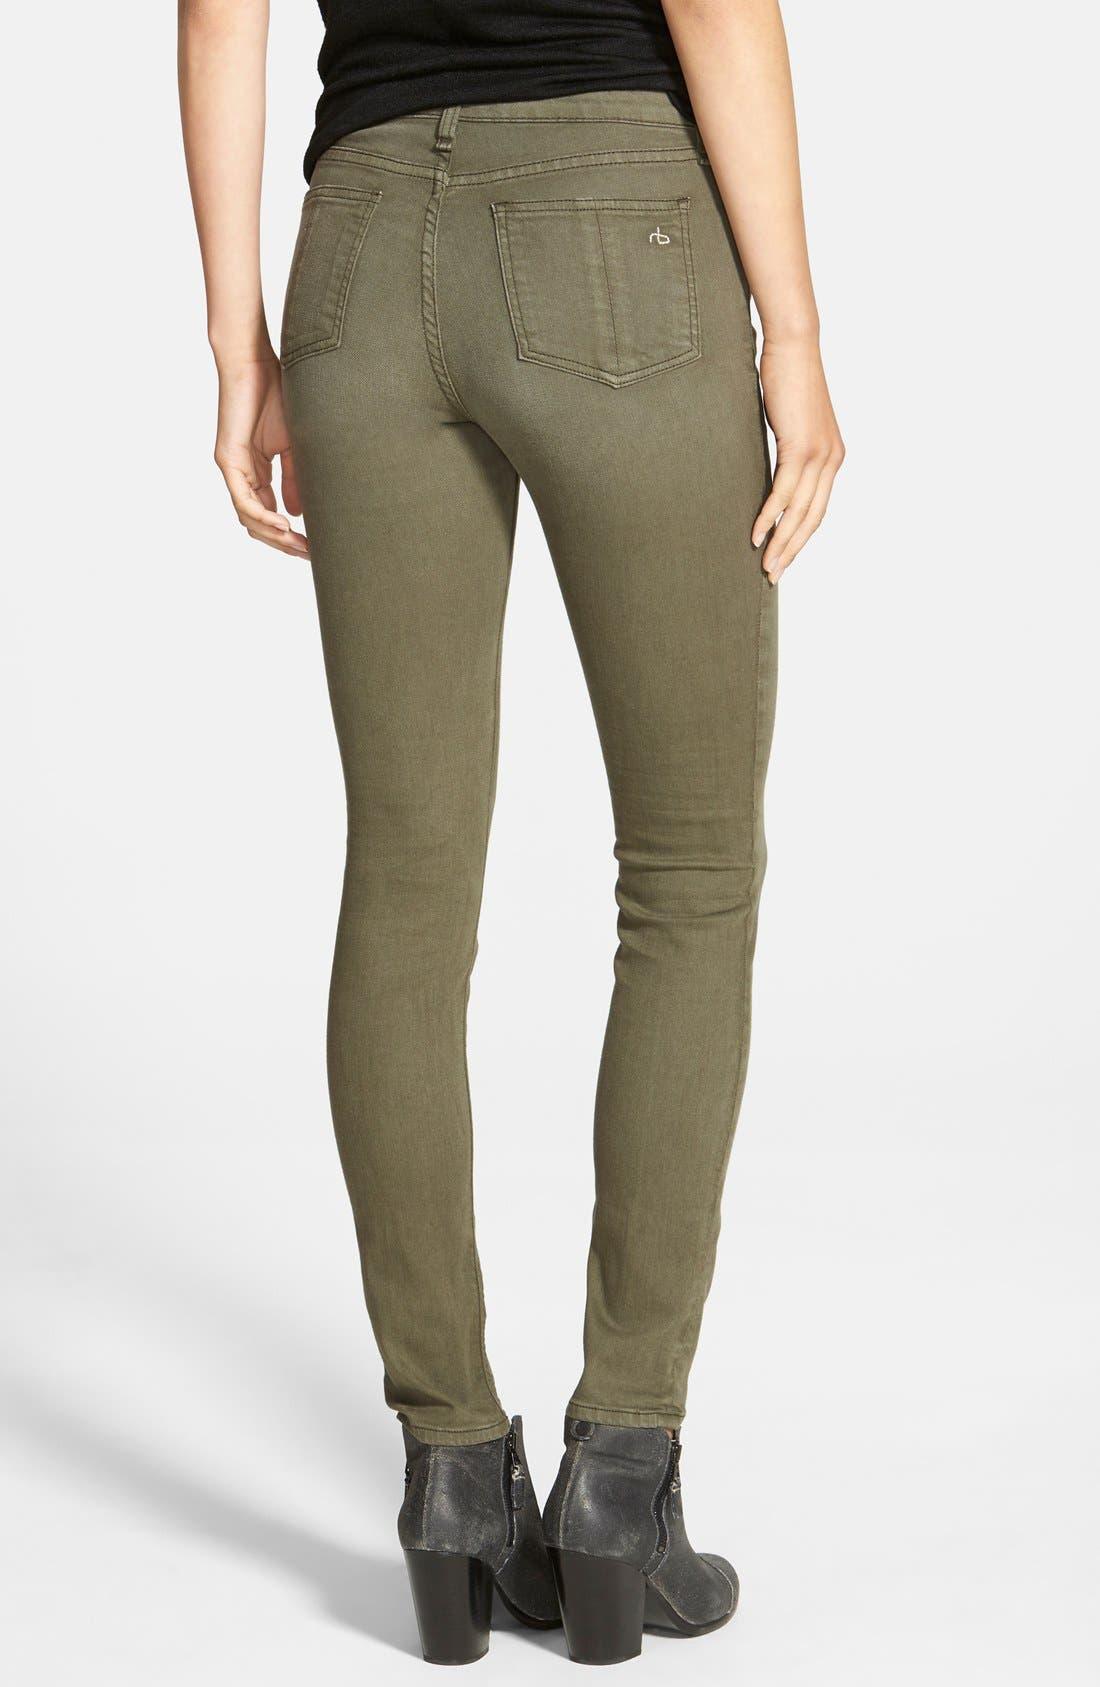 Alternate Image 2  - rag & bone/JEAN 'The Skinny' Jeans (Distressed Fatigue) (Nordstrom Exclusive)